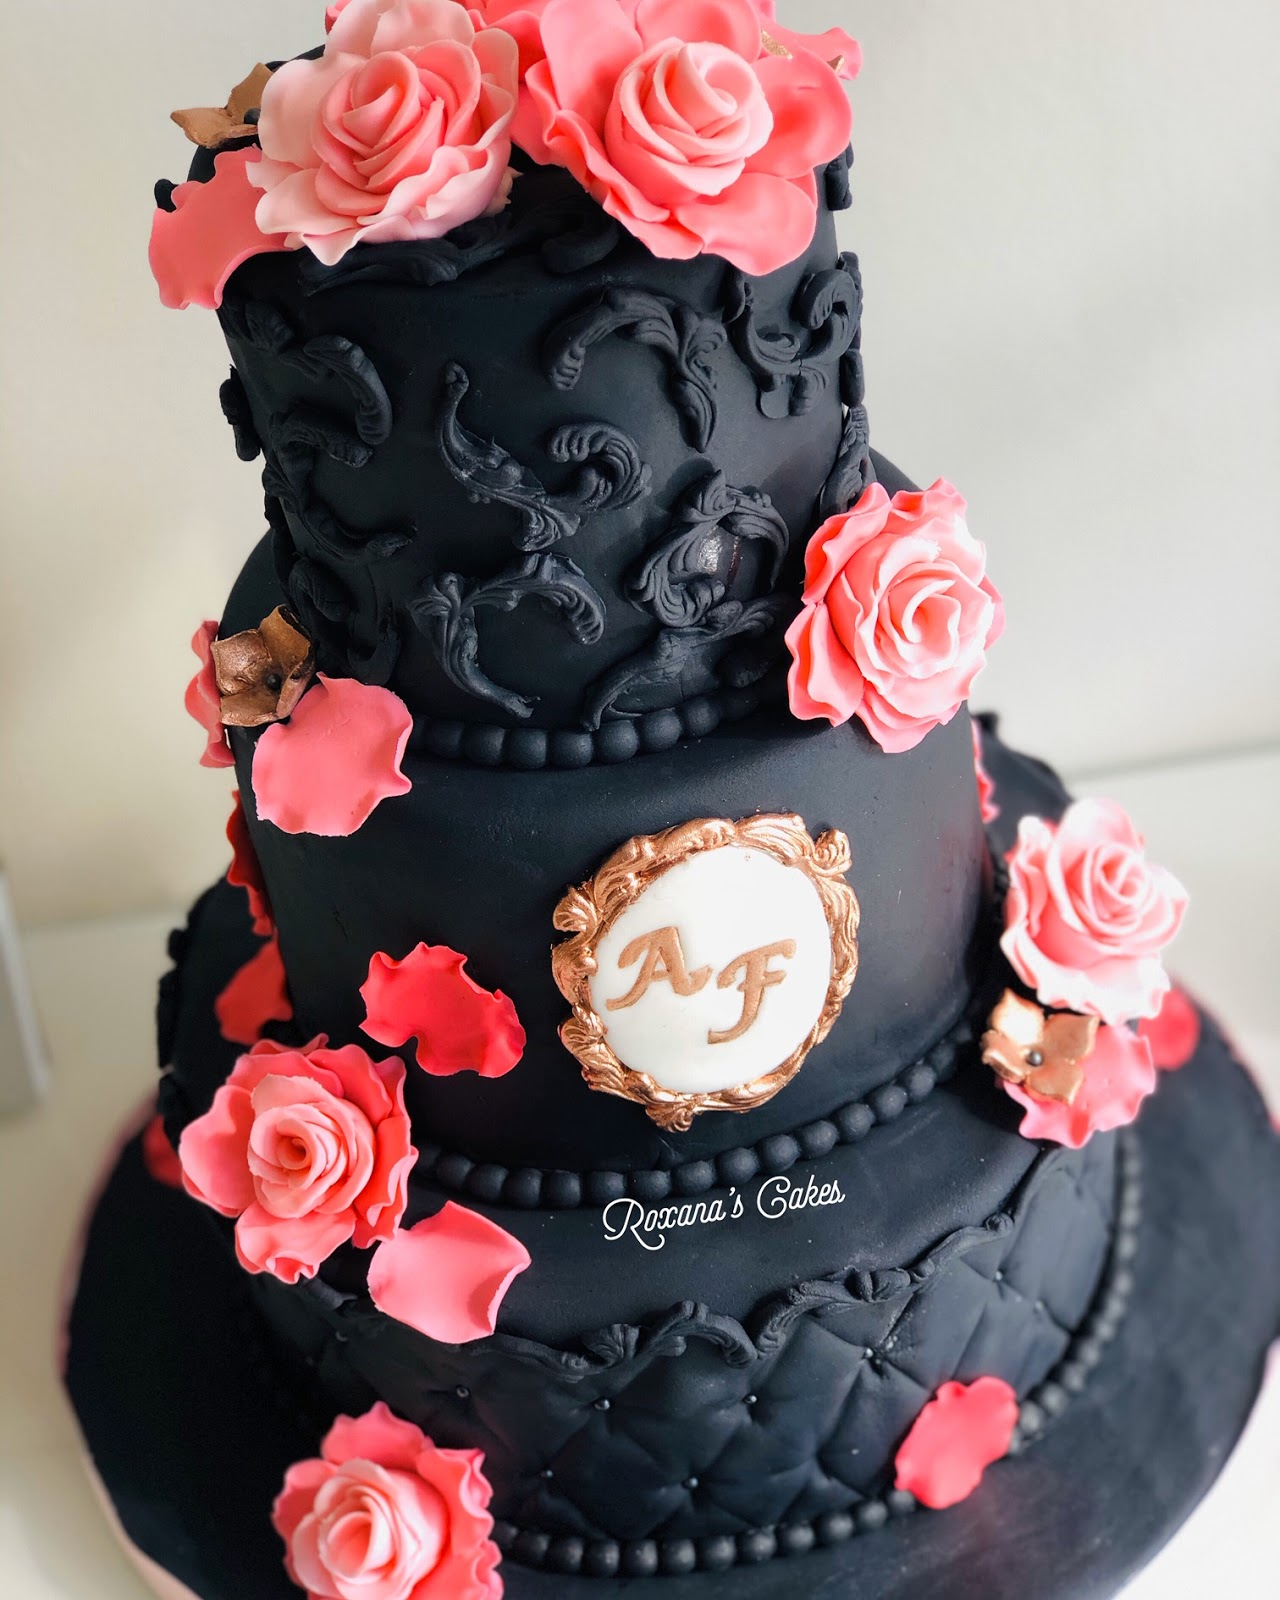 Phenomenal Baking With Roxanas Cakes 2019 Birthday Cards Printable Inklcafe Filternl